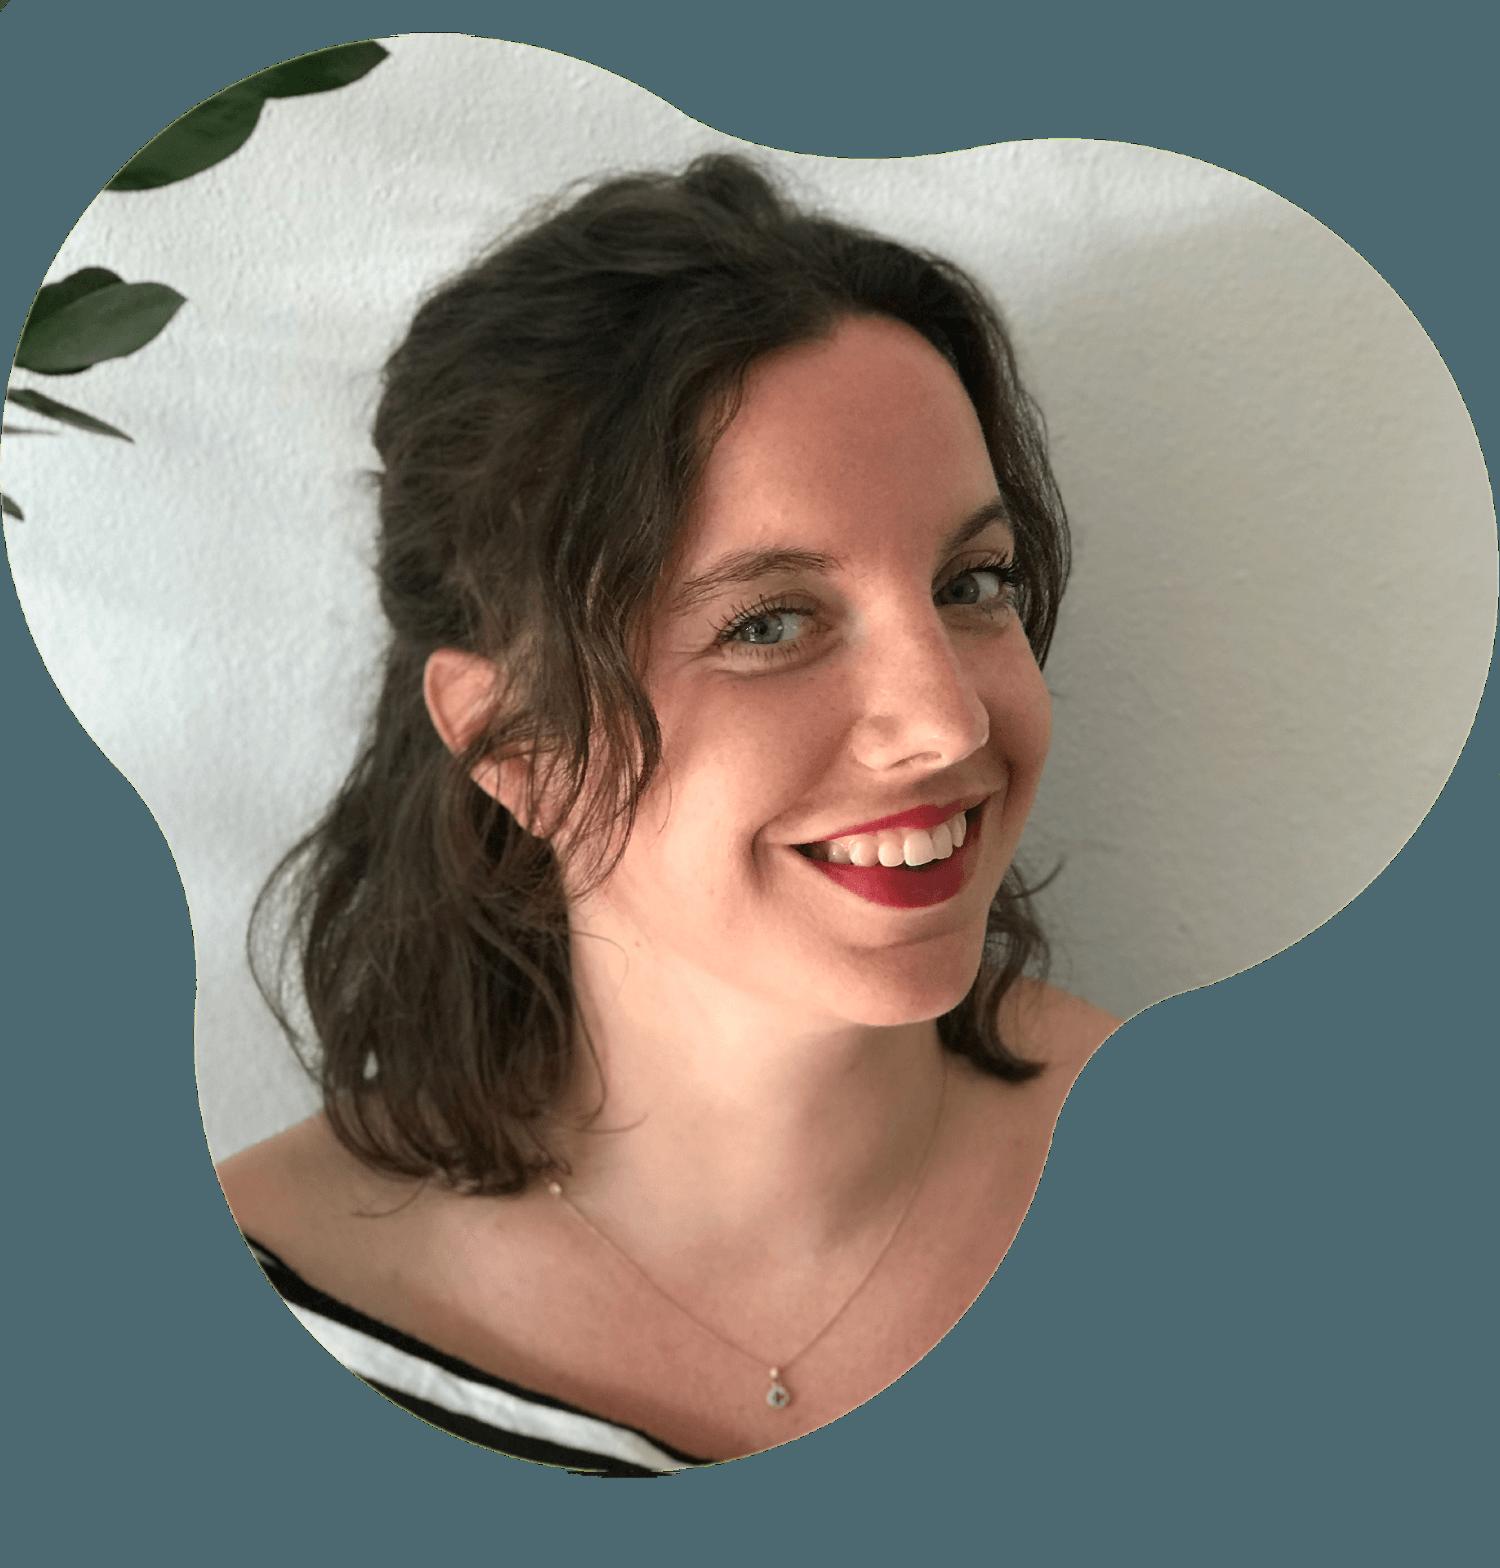 Verloskundige Roos, docent Mom & co Amsterdam